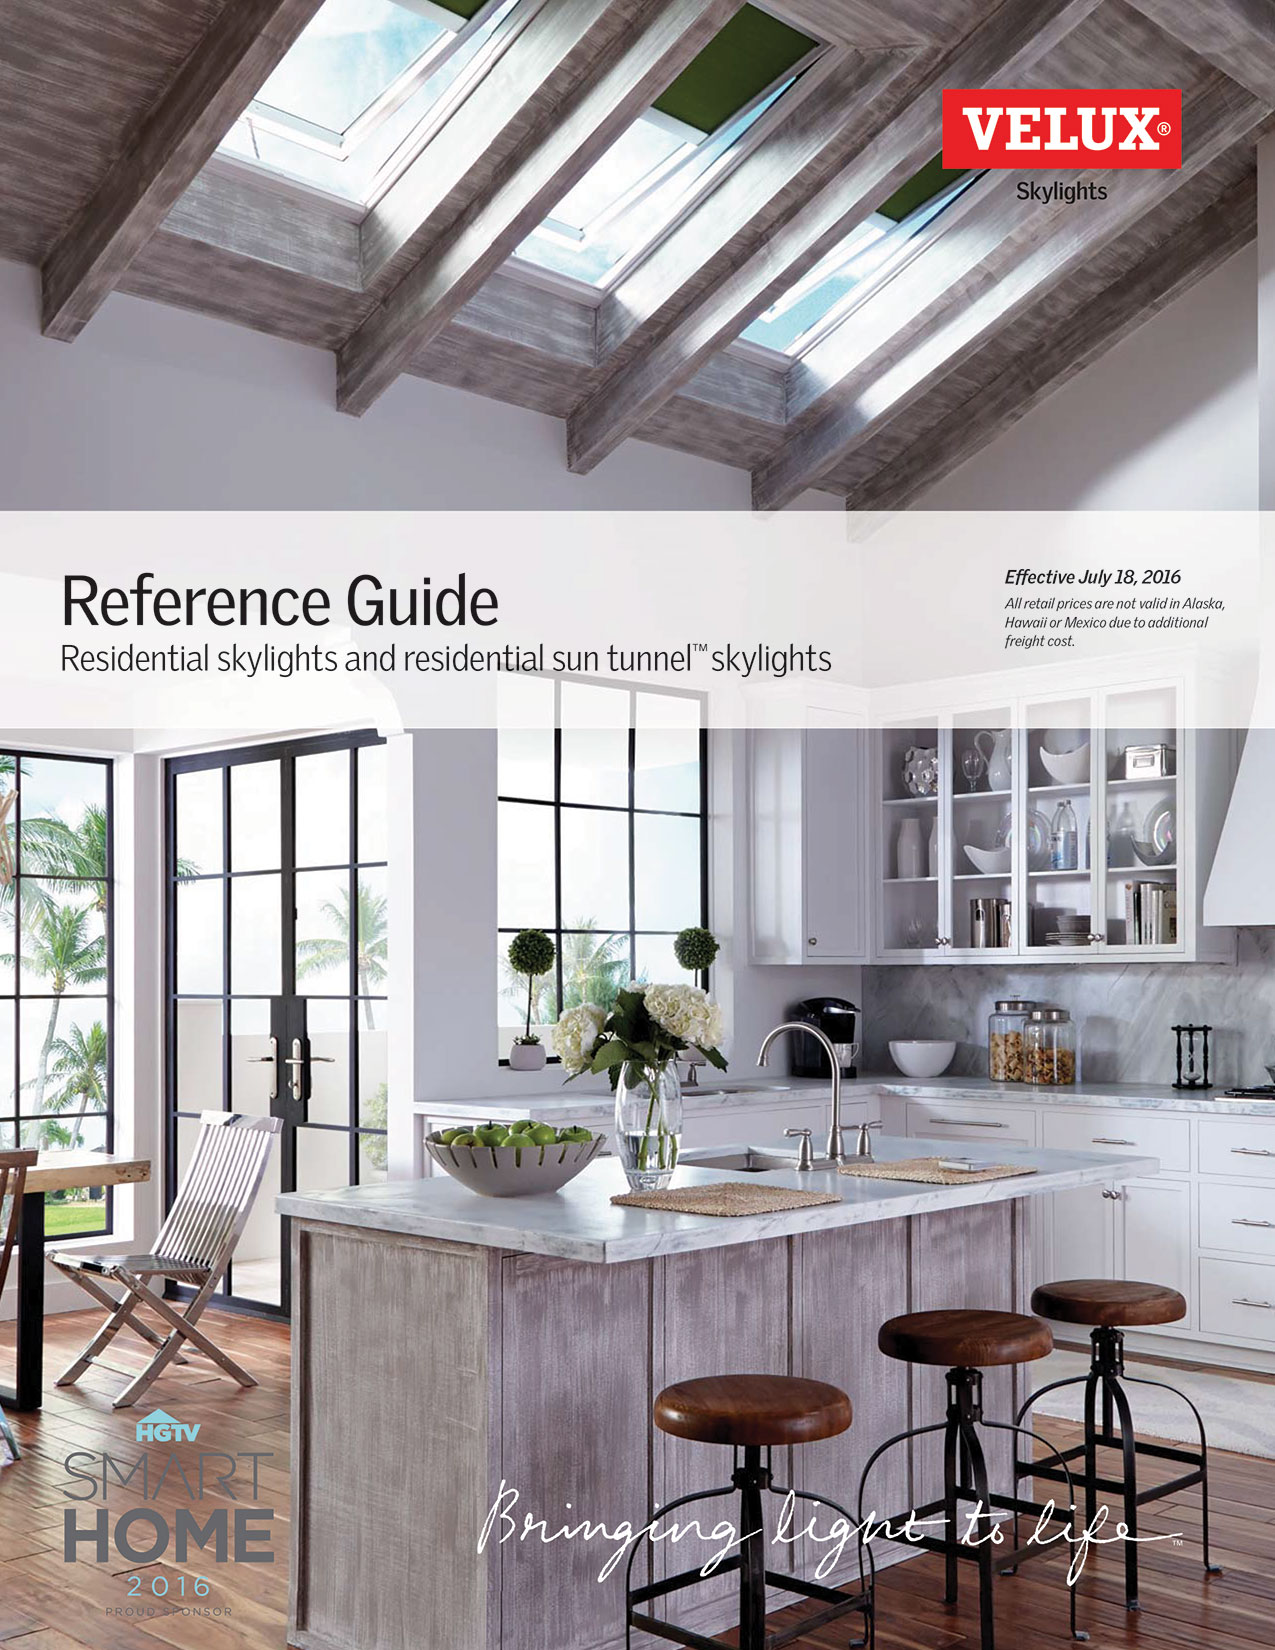 skylight-reference-guide.jpg